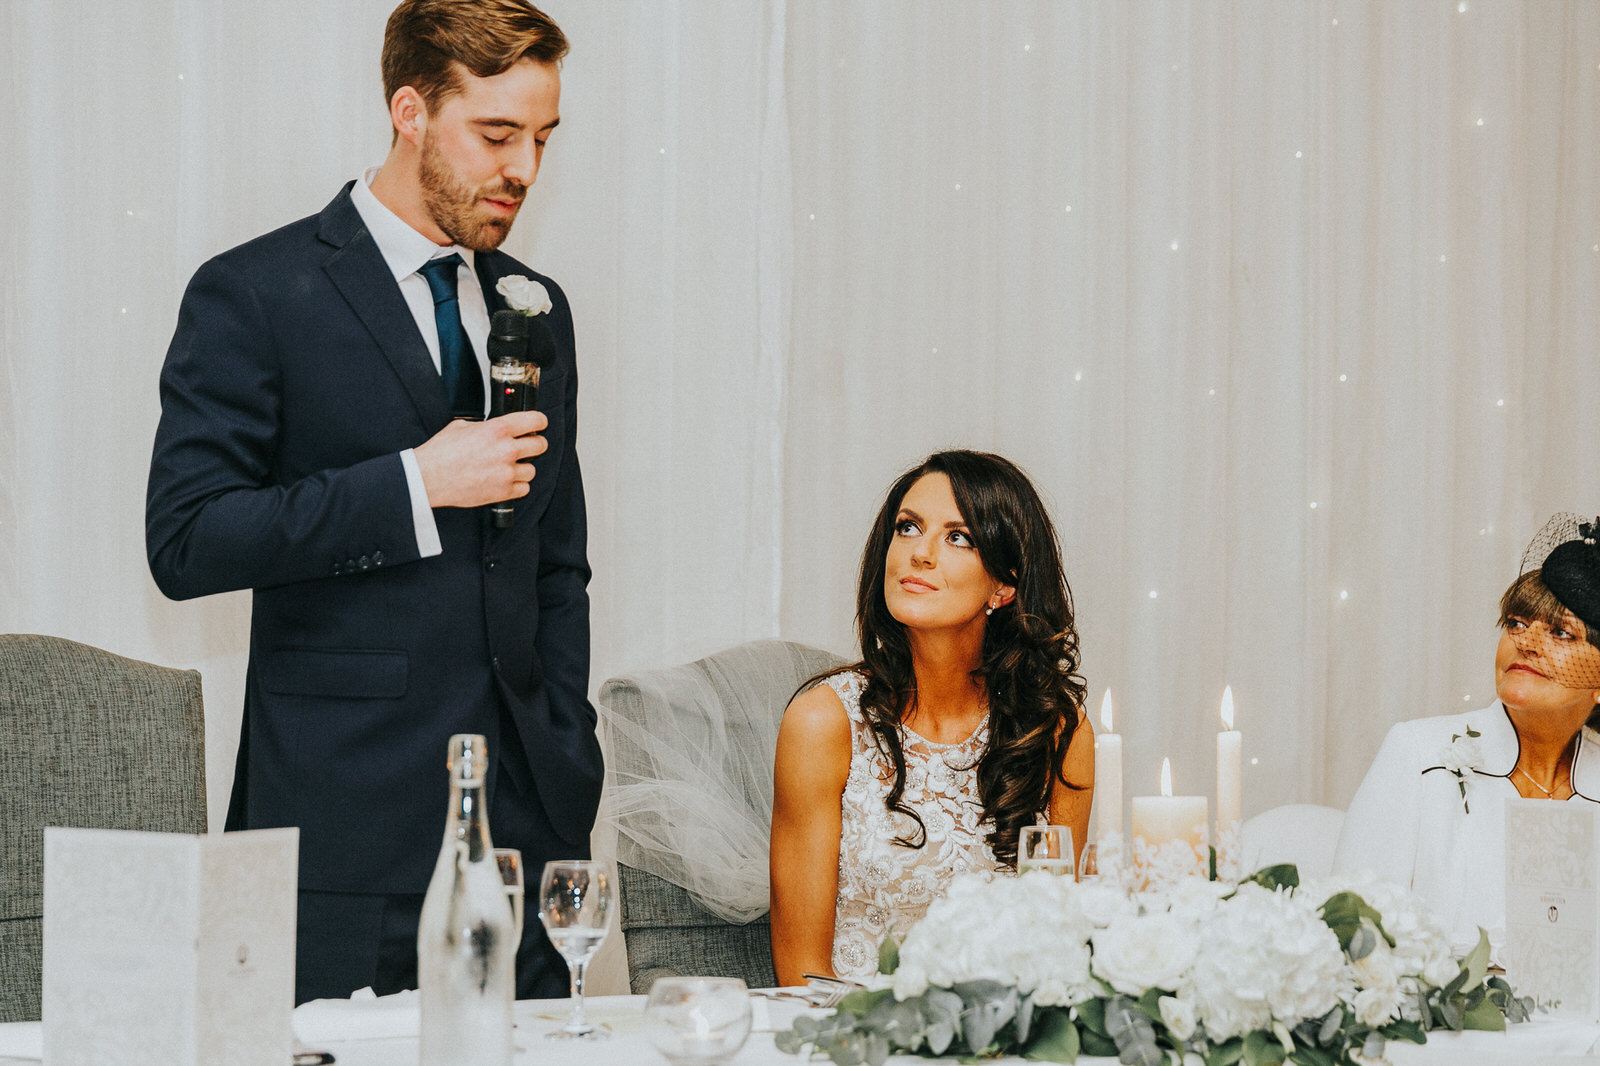 Roger_Kenny_wedding_photographer_508.jpg